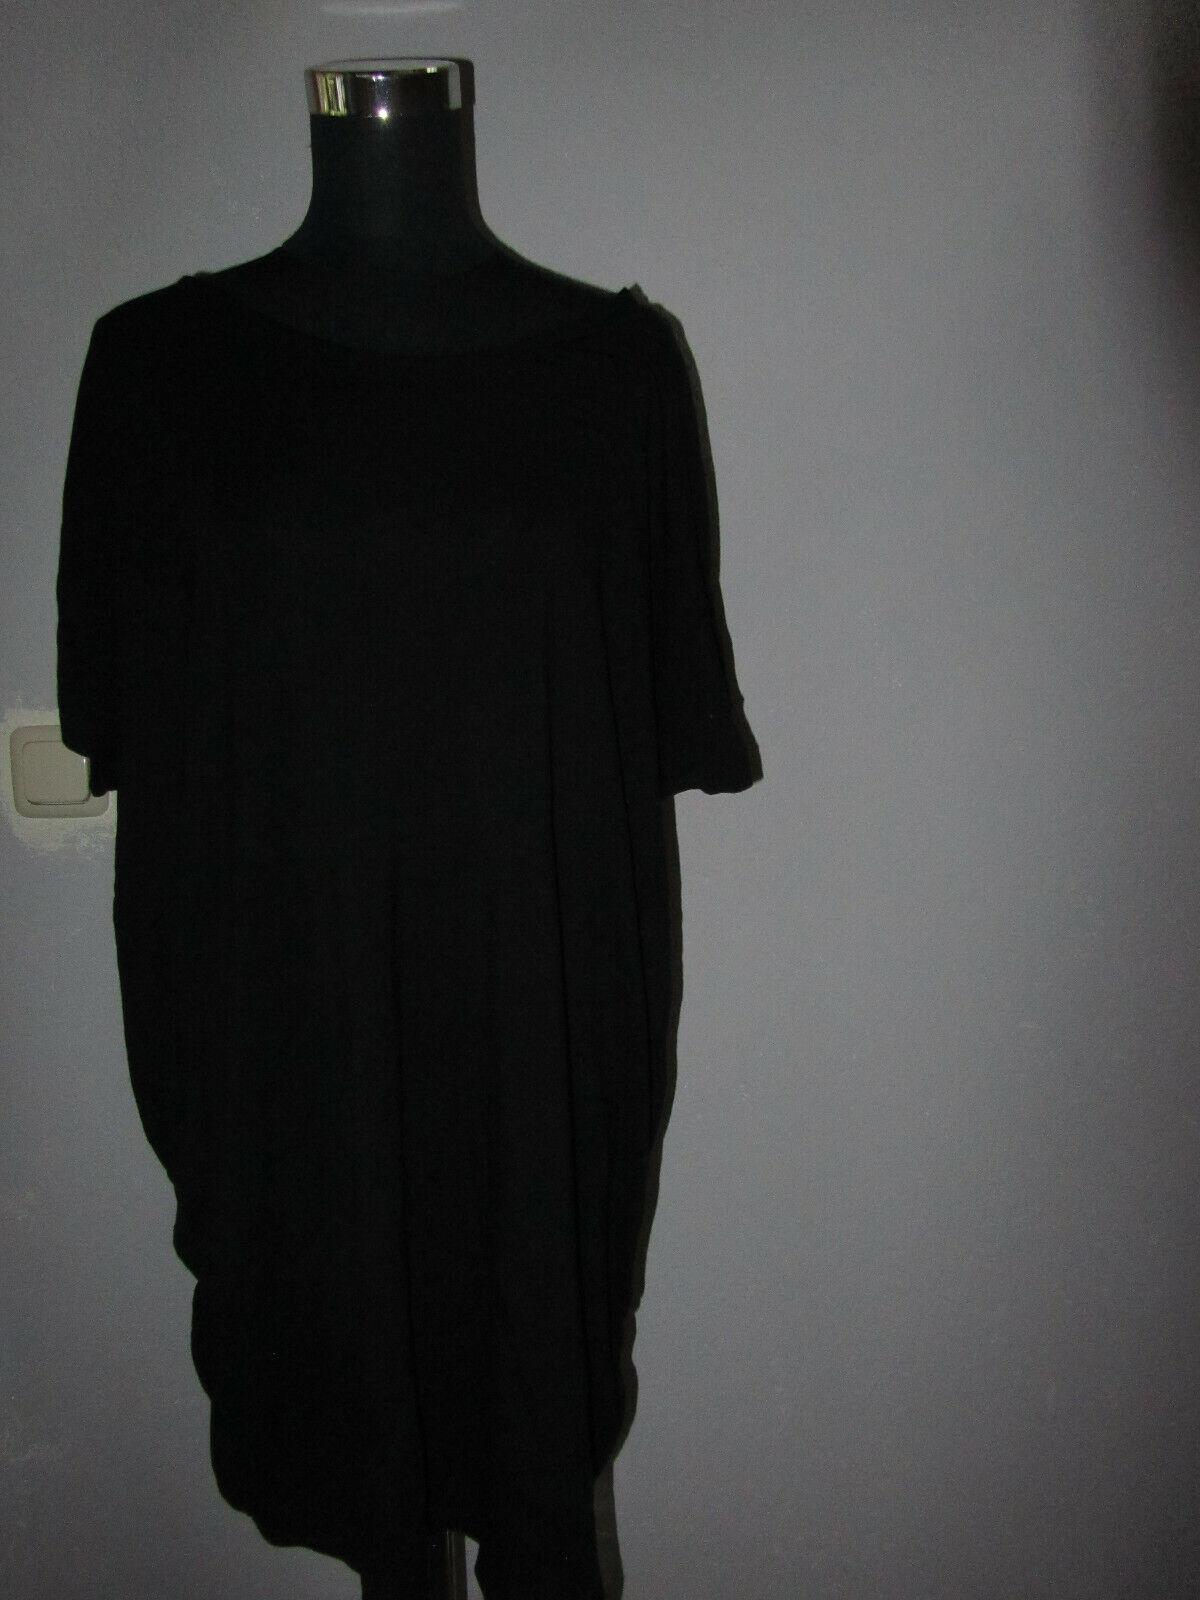 Taubert Bigshirt Gr. 44 schwarz Viskose/ neuw.